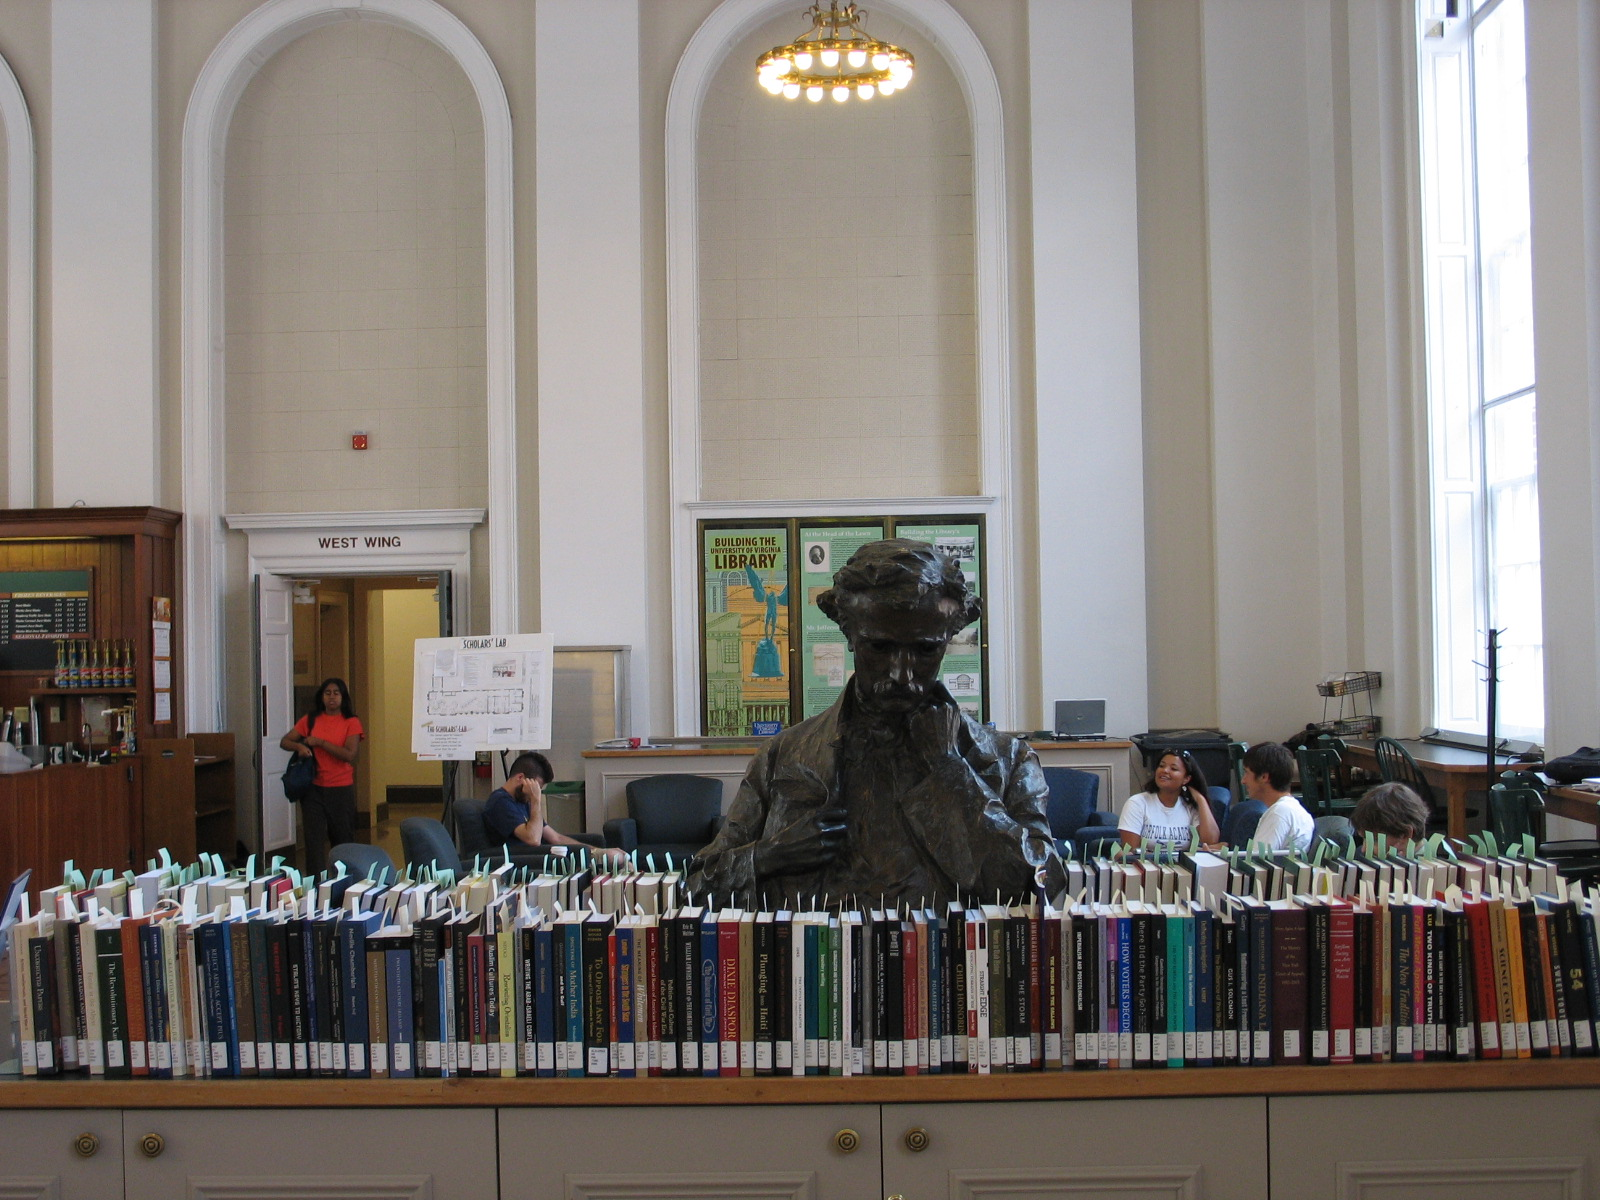 File:Alderman Library UVa.jpg - Wikimedia Commons